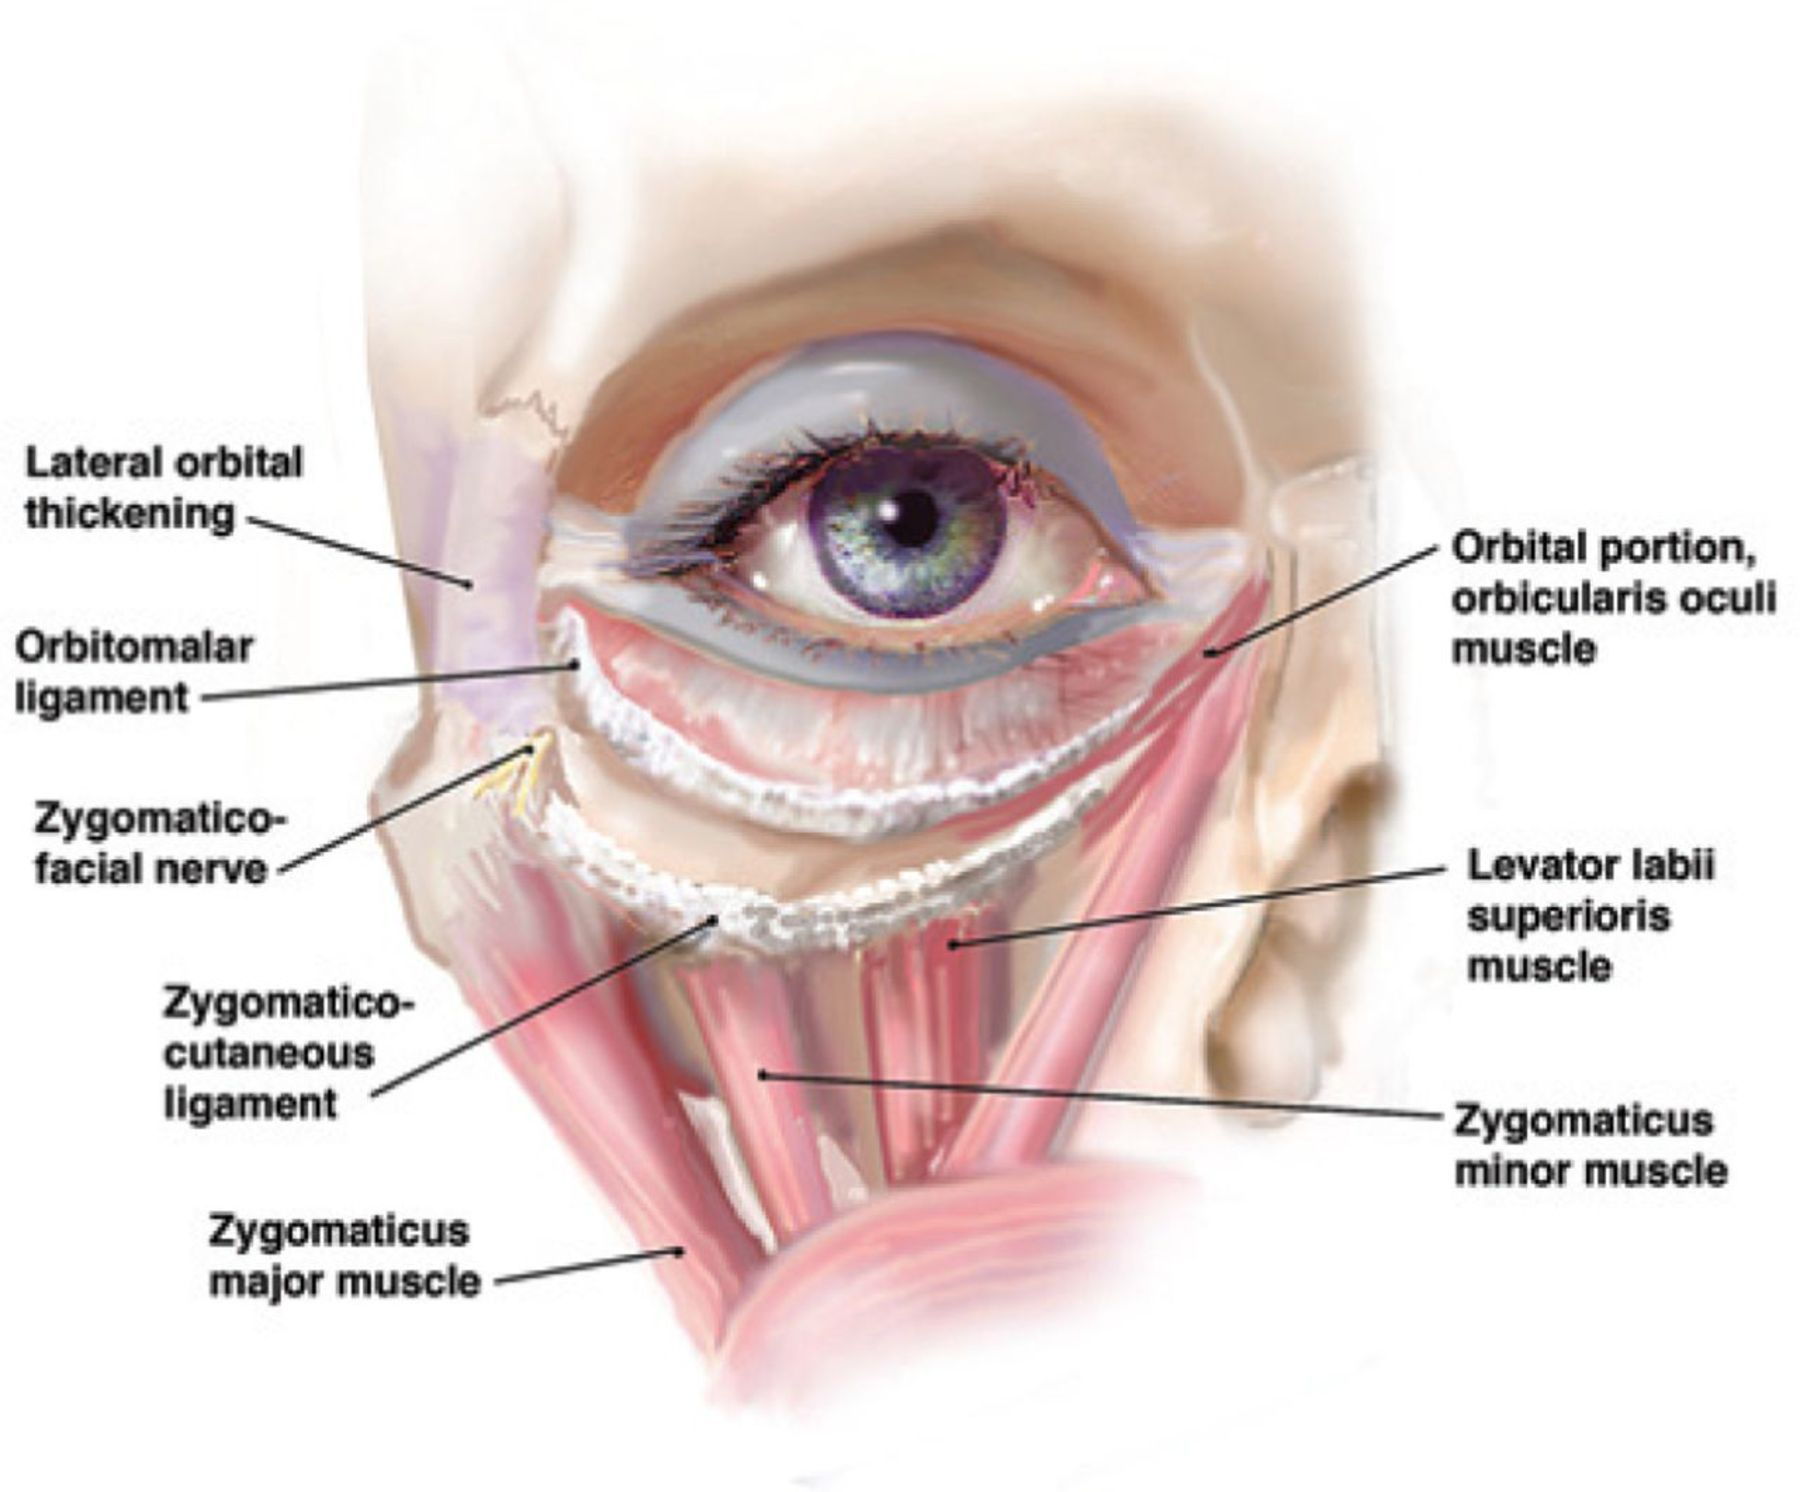 eye muscle anatomy - Google 검색 | Anatomia ja body | Pinterest ...